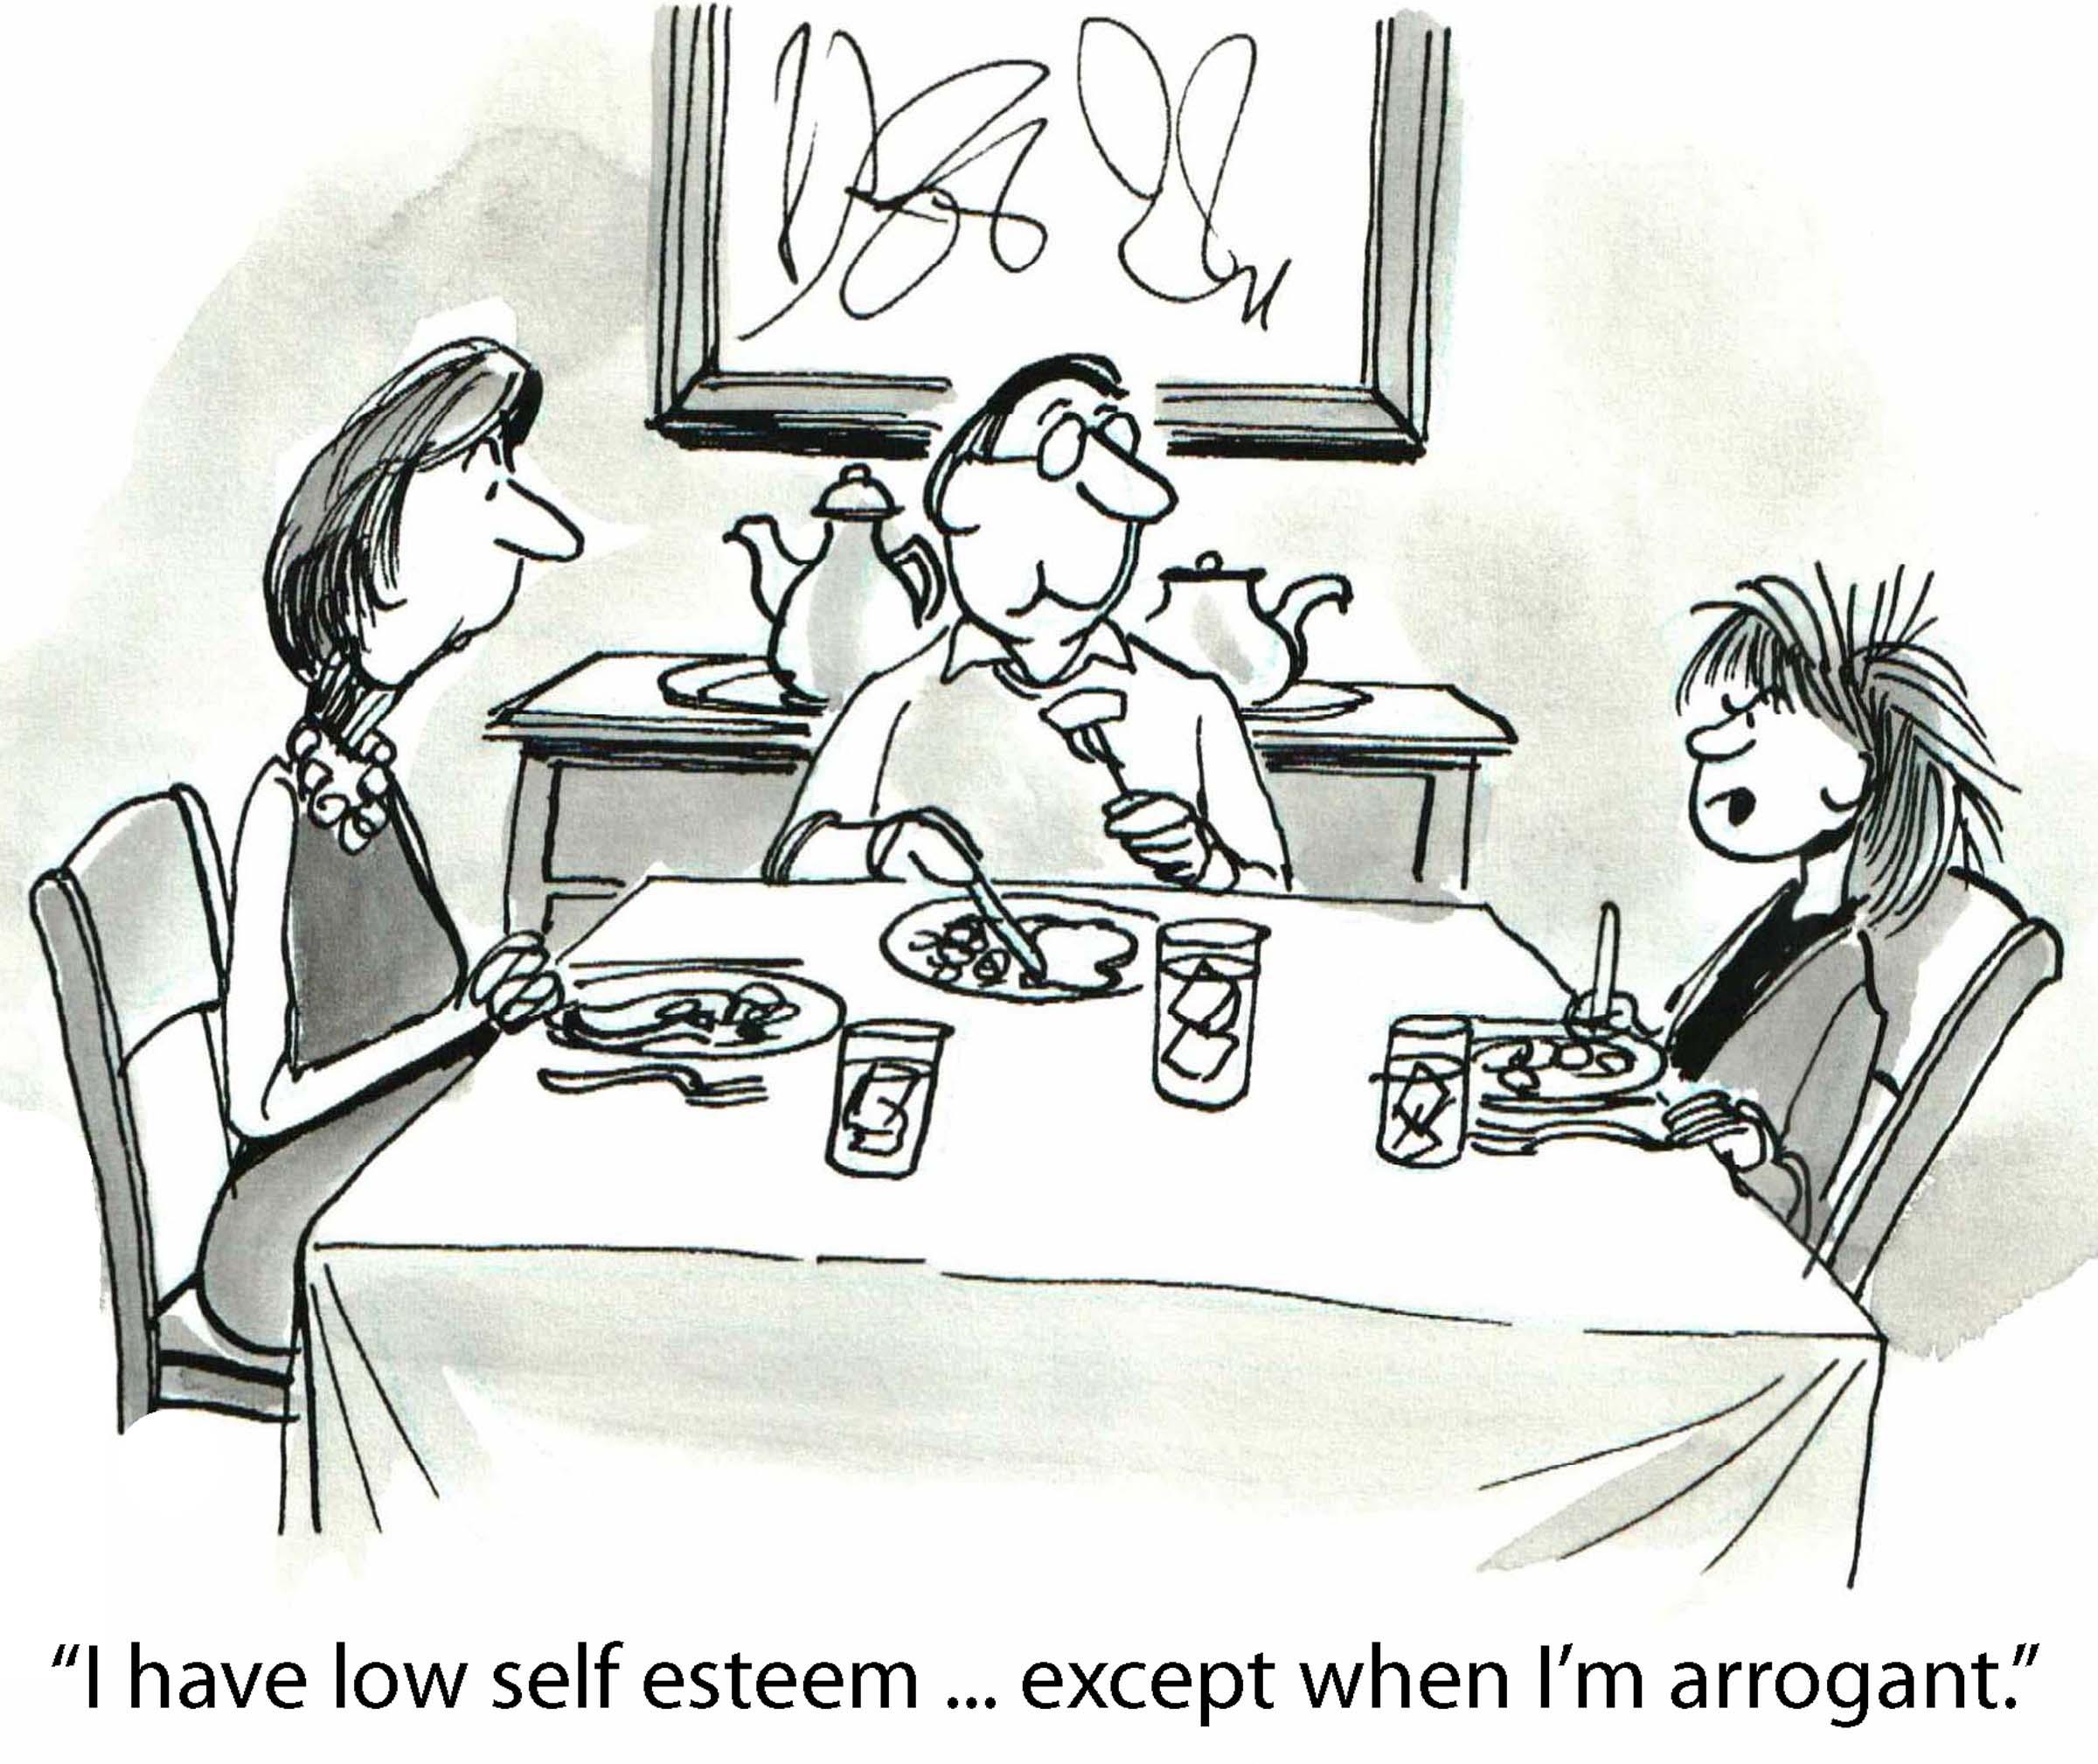 bigstock-Low-Self-Esteem-80251370.jpg